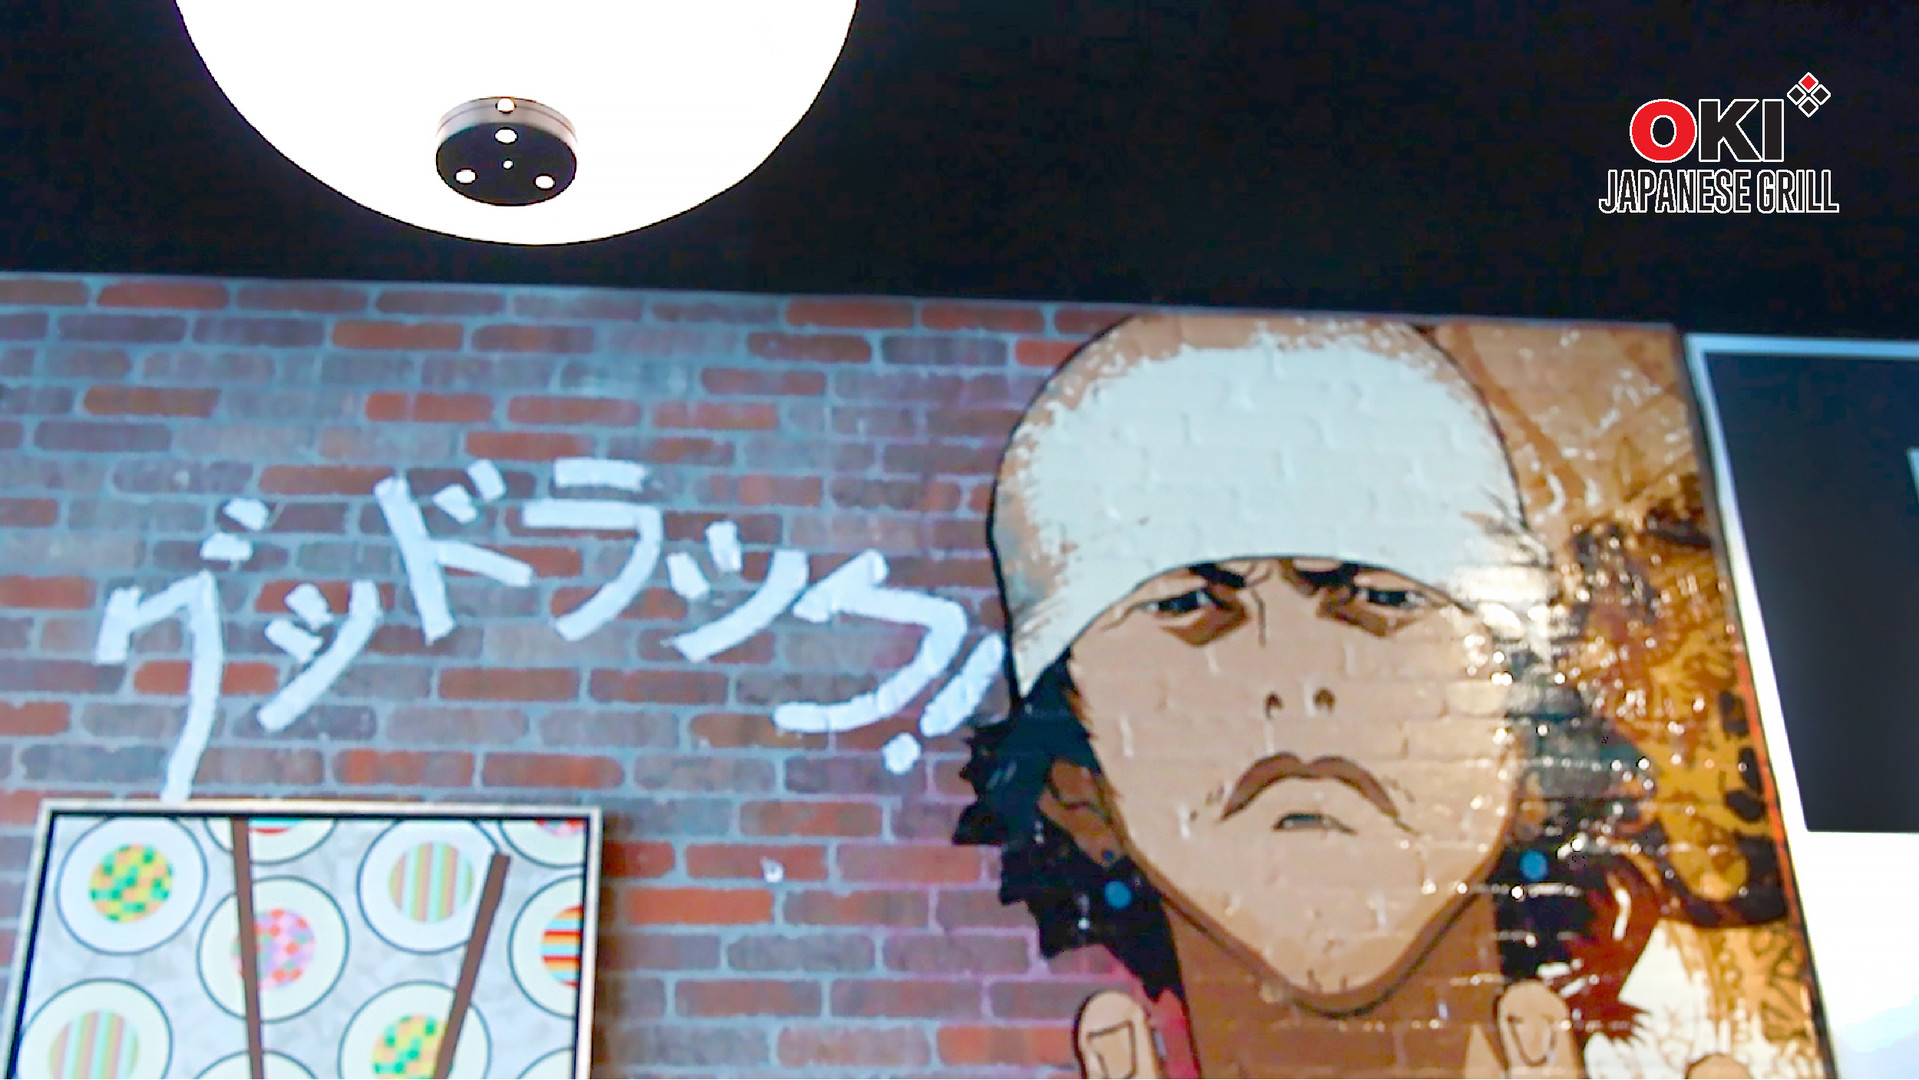 Oki Japanese Grill_Captured Photos_Jan 2